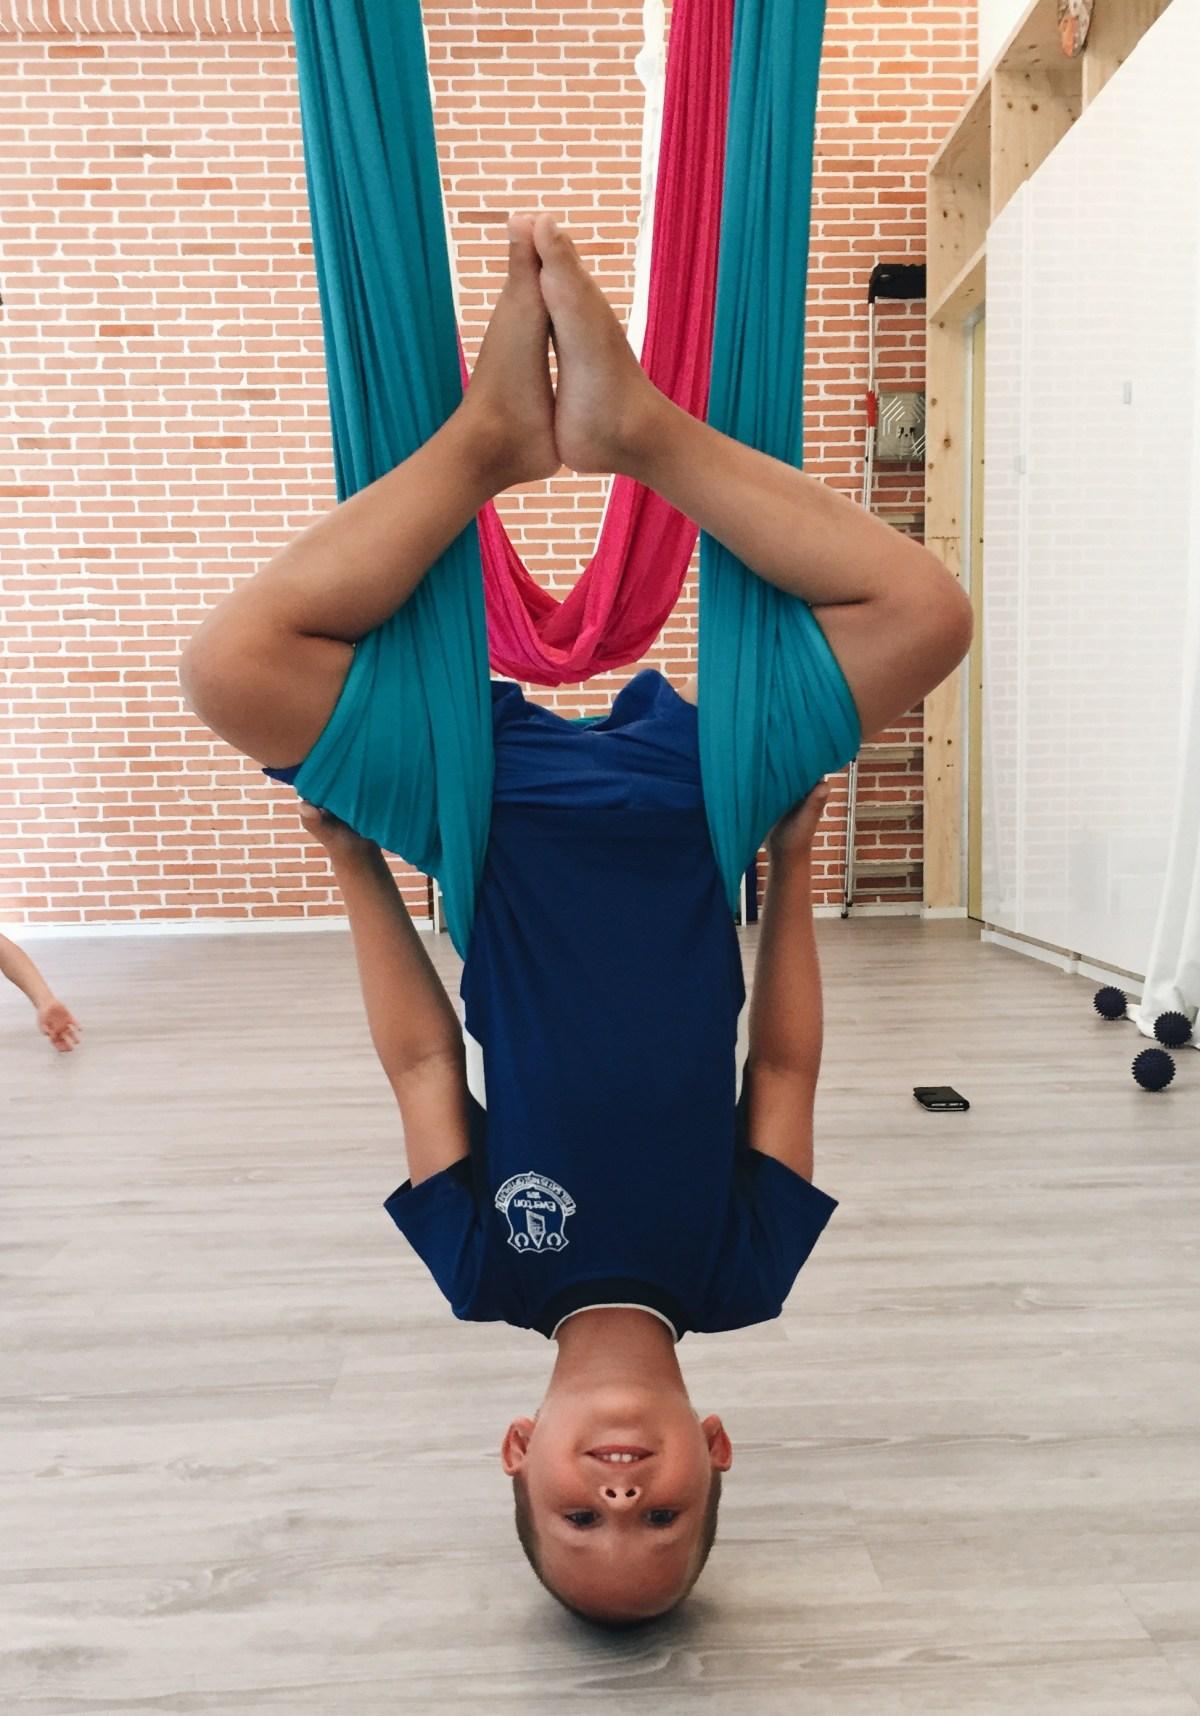 yoga aerien suisse blog maman lifestyle sport famille thereseandthekids